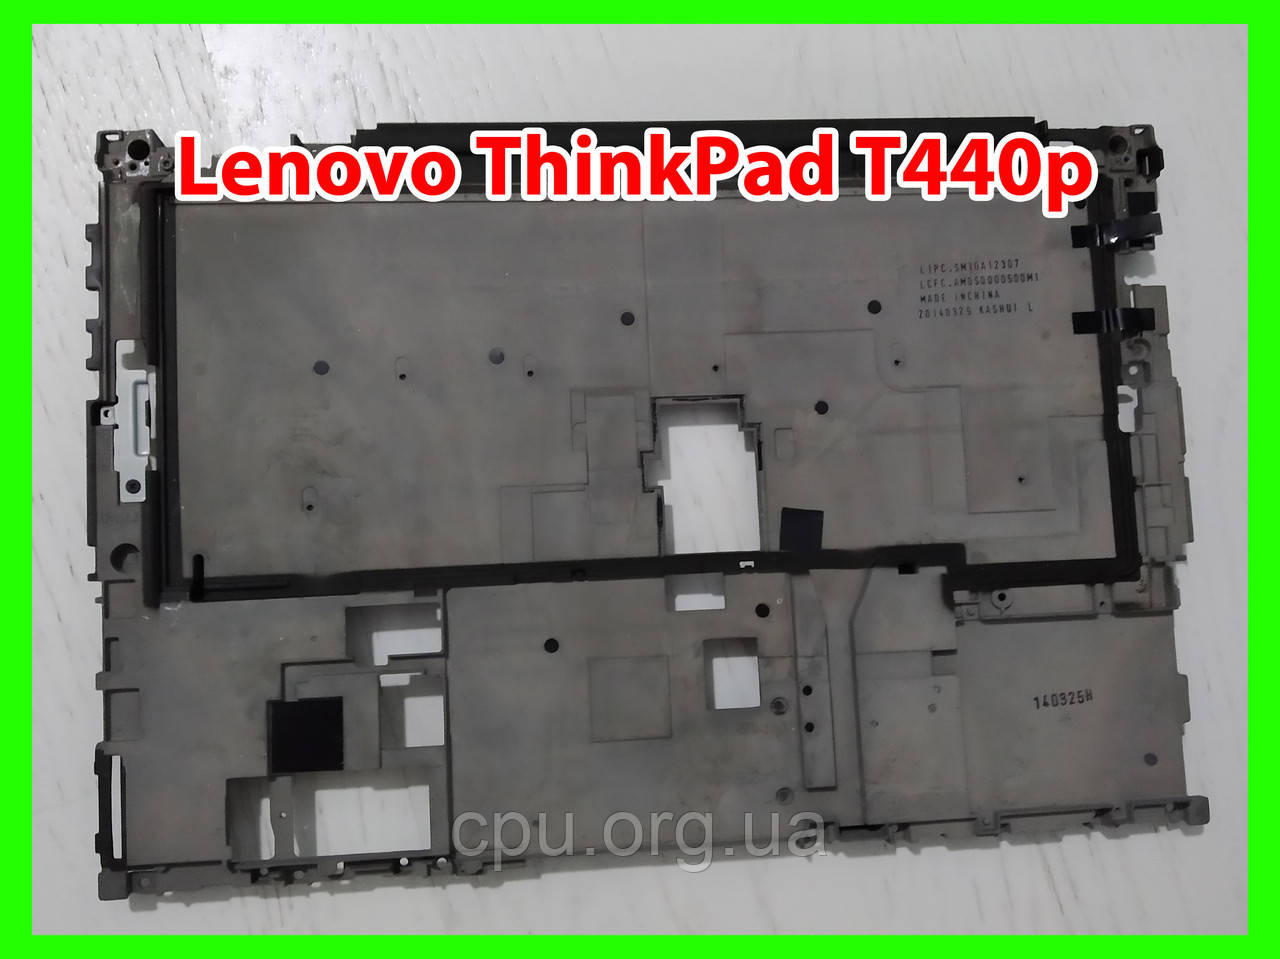 Срудняя частина корпусу Lenovo ThinkPad T440p